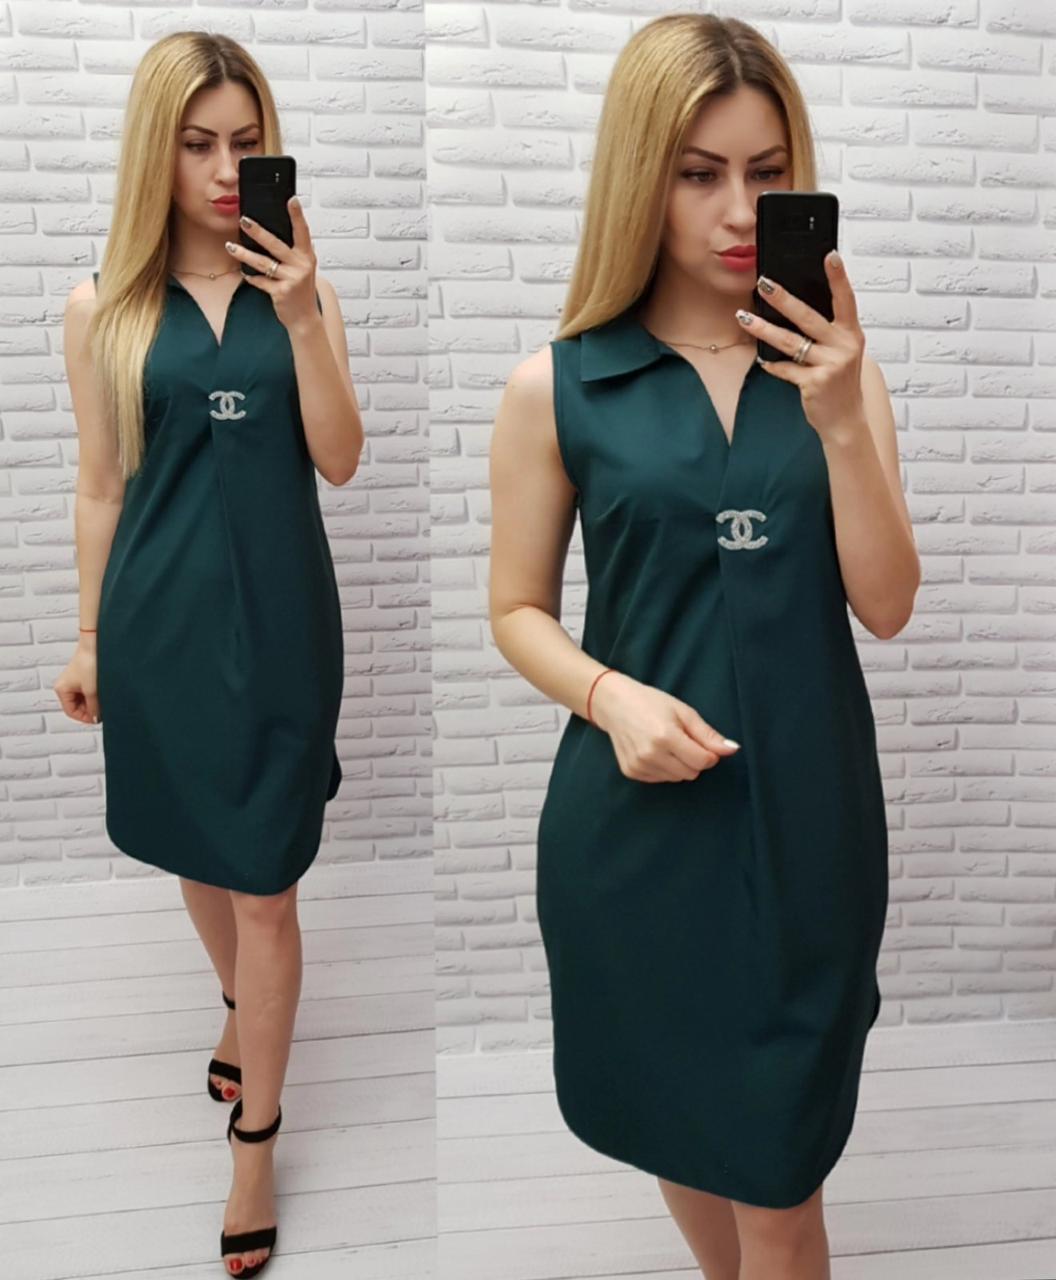 Арт. 167 Летнее платье без рукава темно-зеленое/ темно зеленого цвета/ хвоя